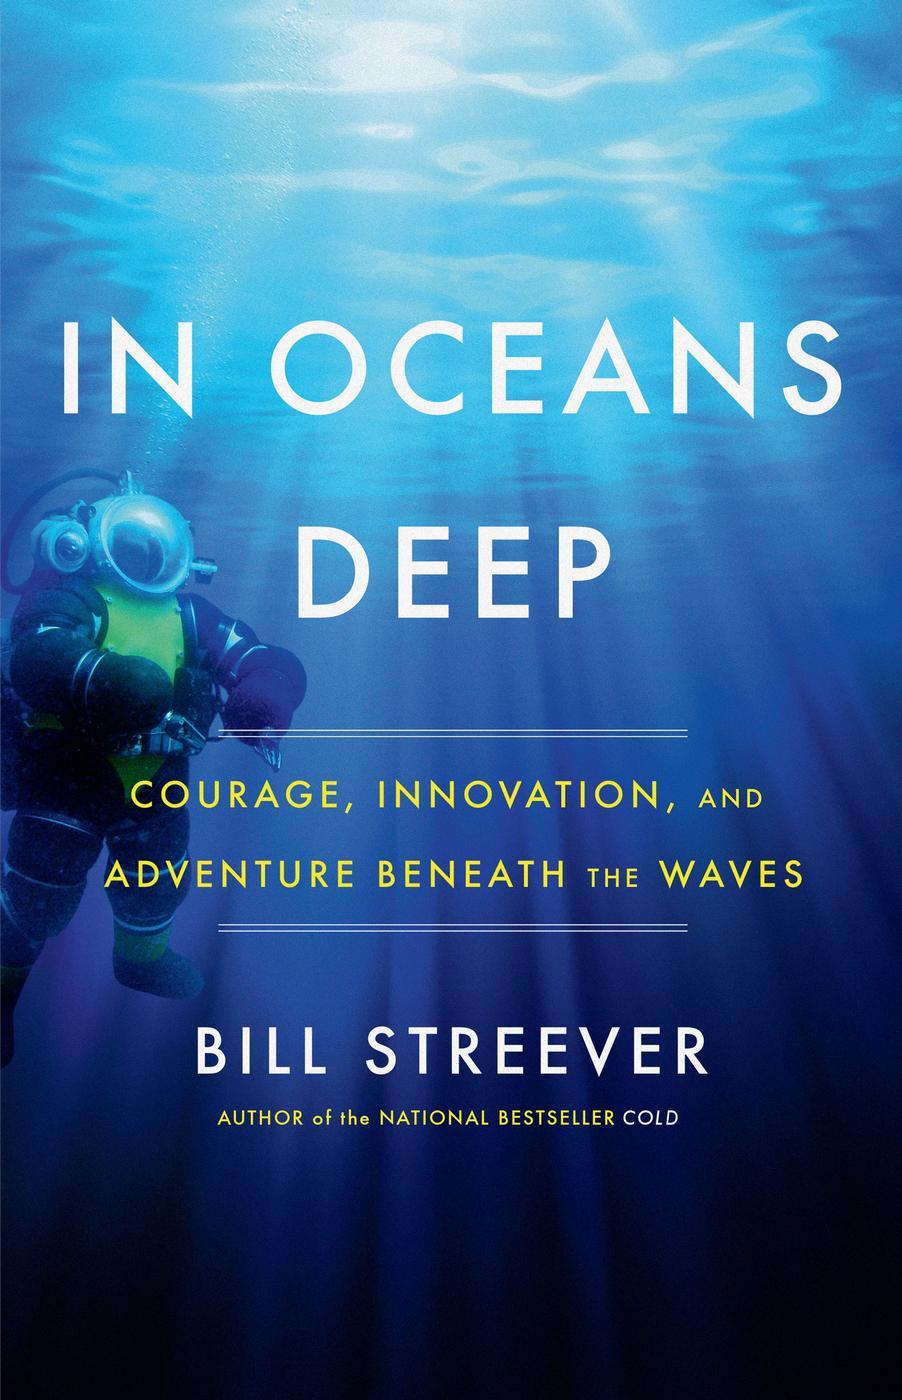 In Oceans Deep Bill Streever